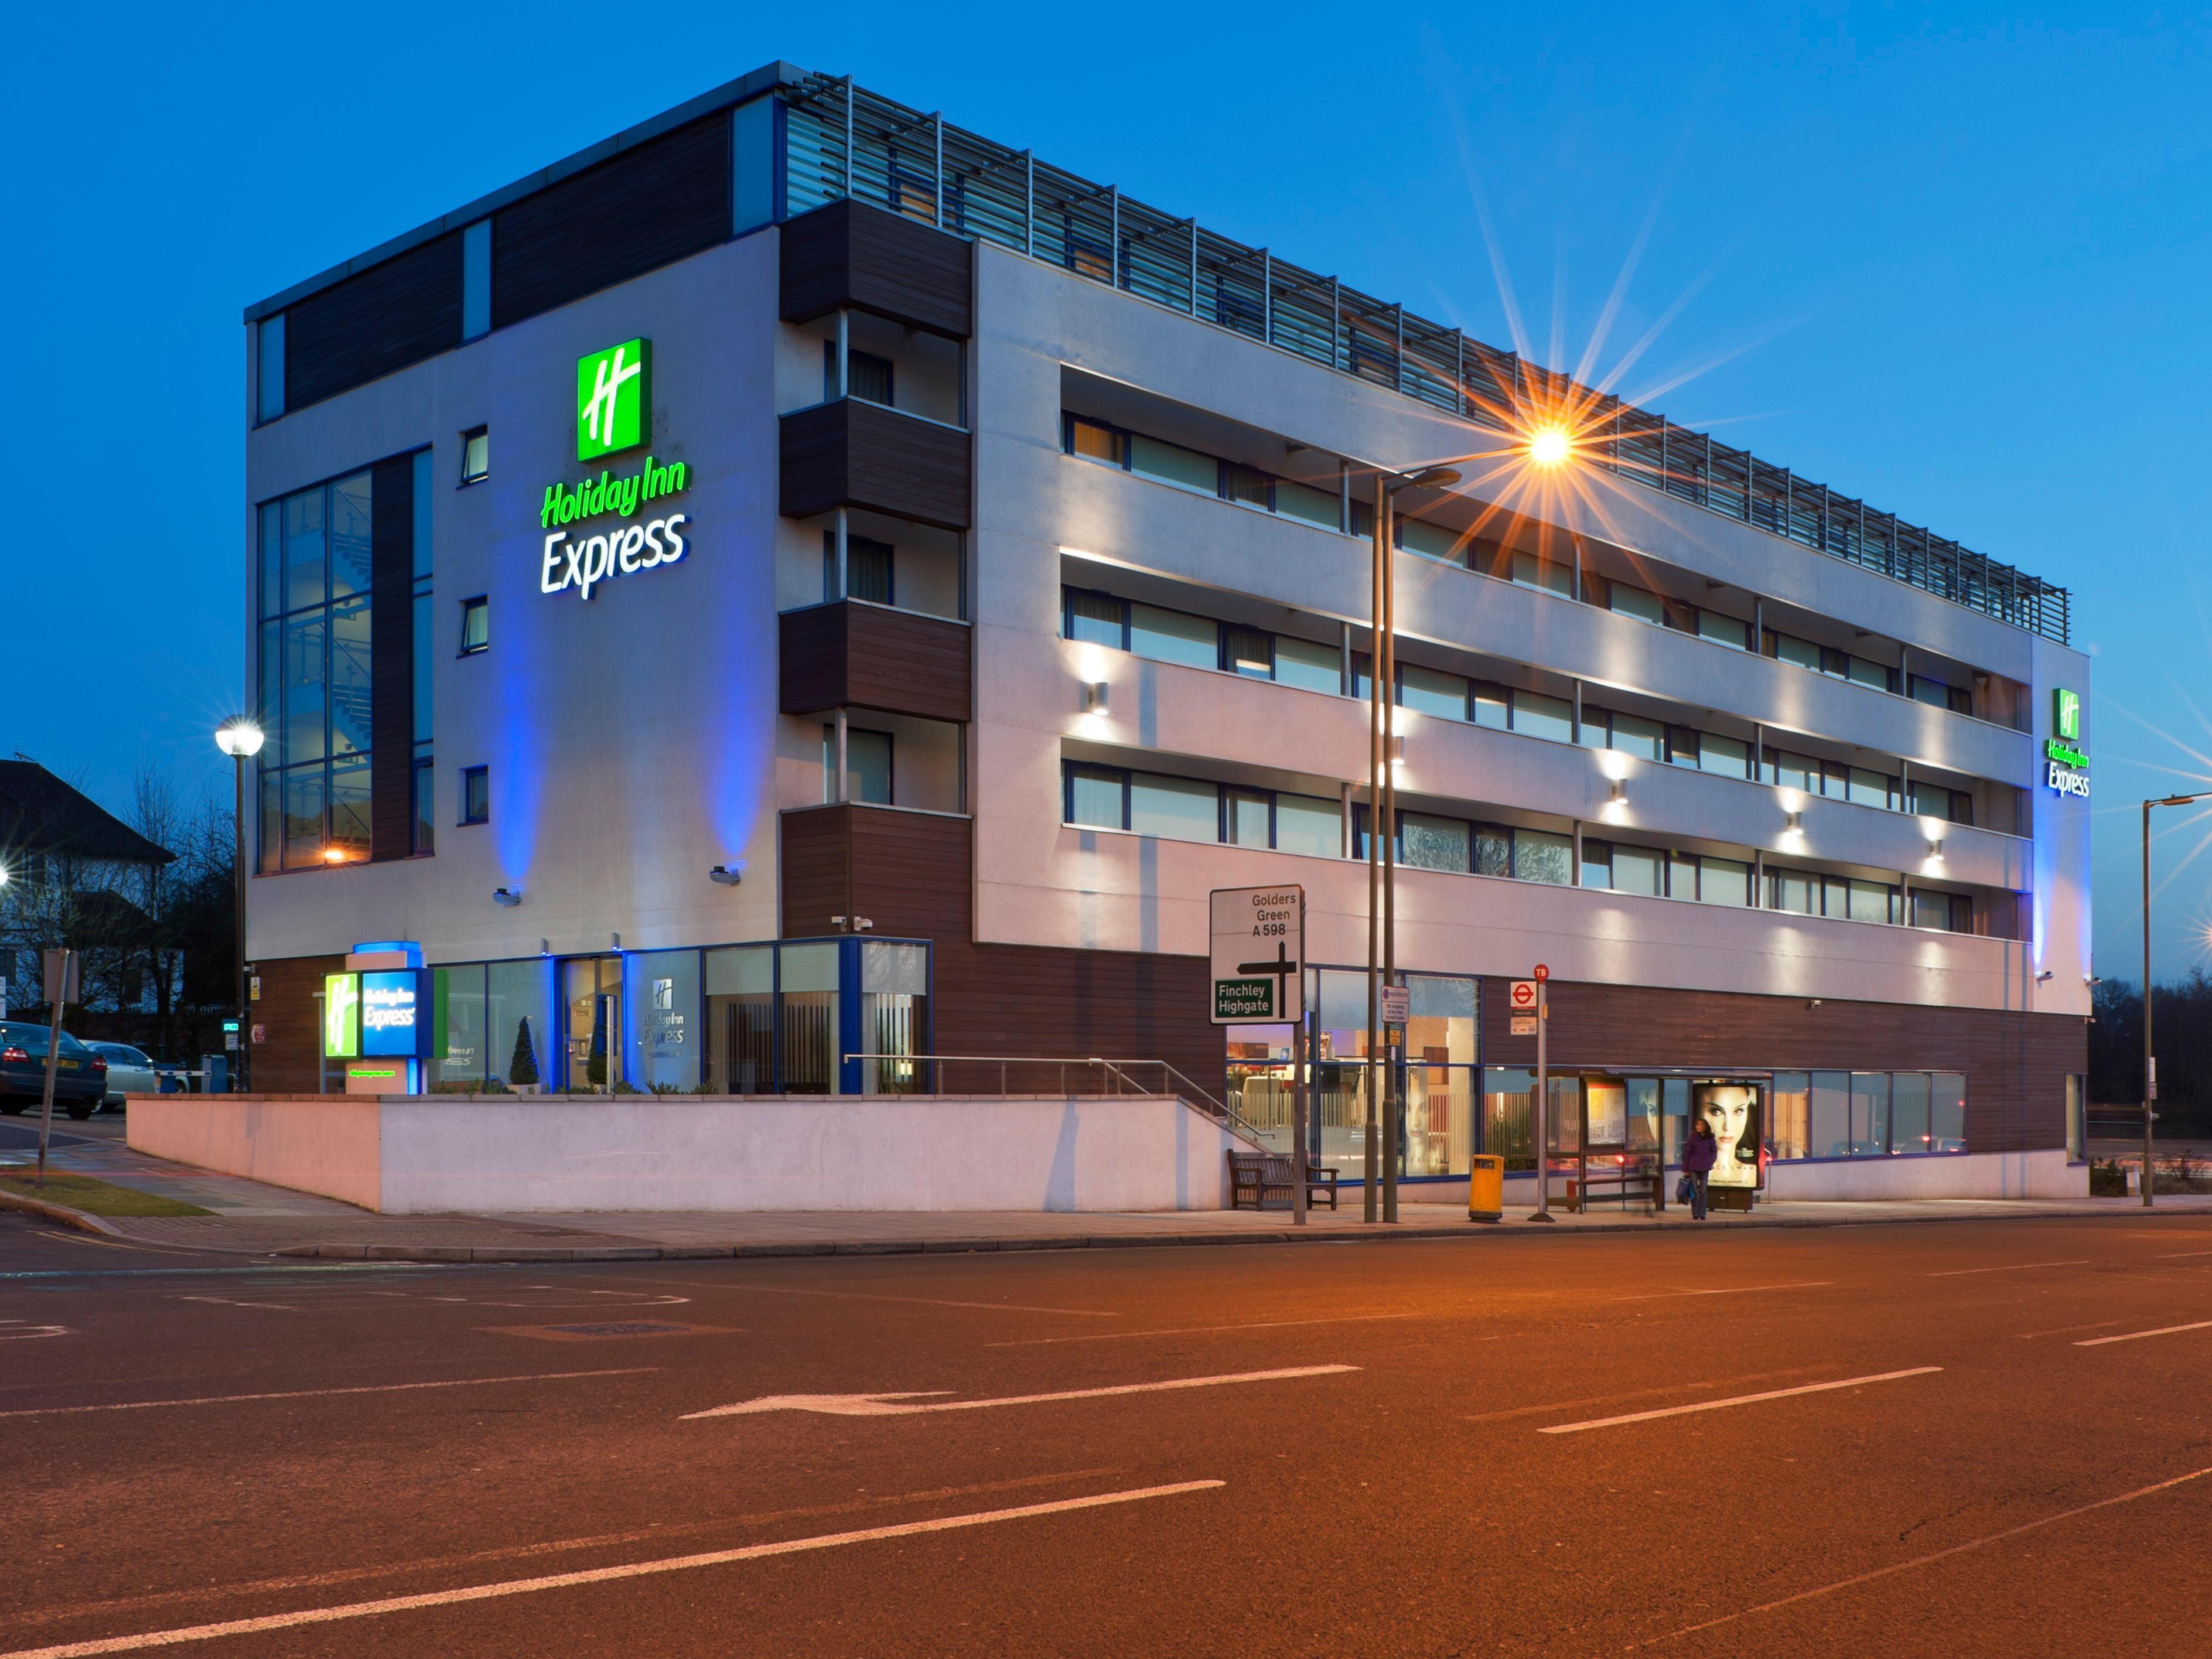 Holiday Inn Express Hotel London Golders Green A406